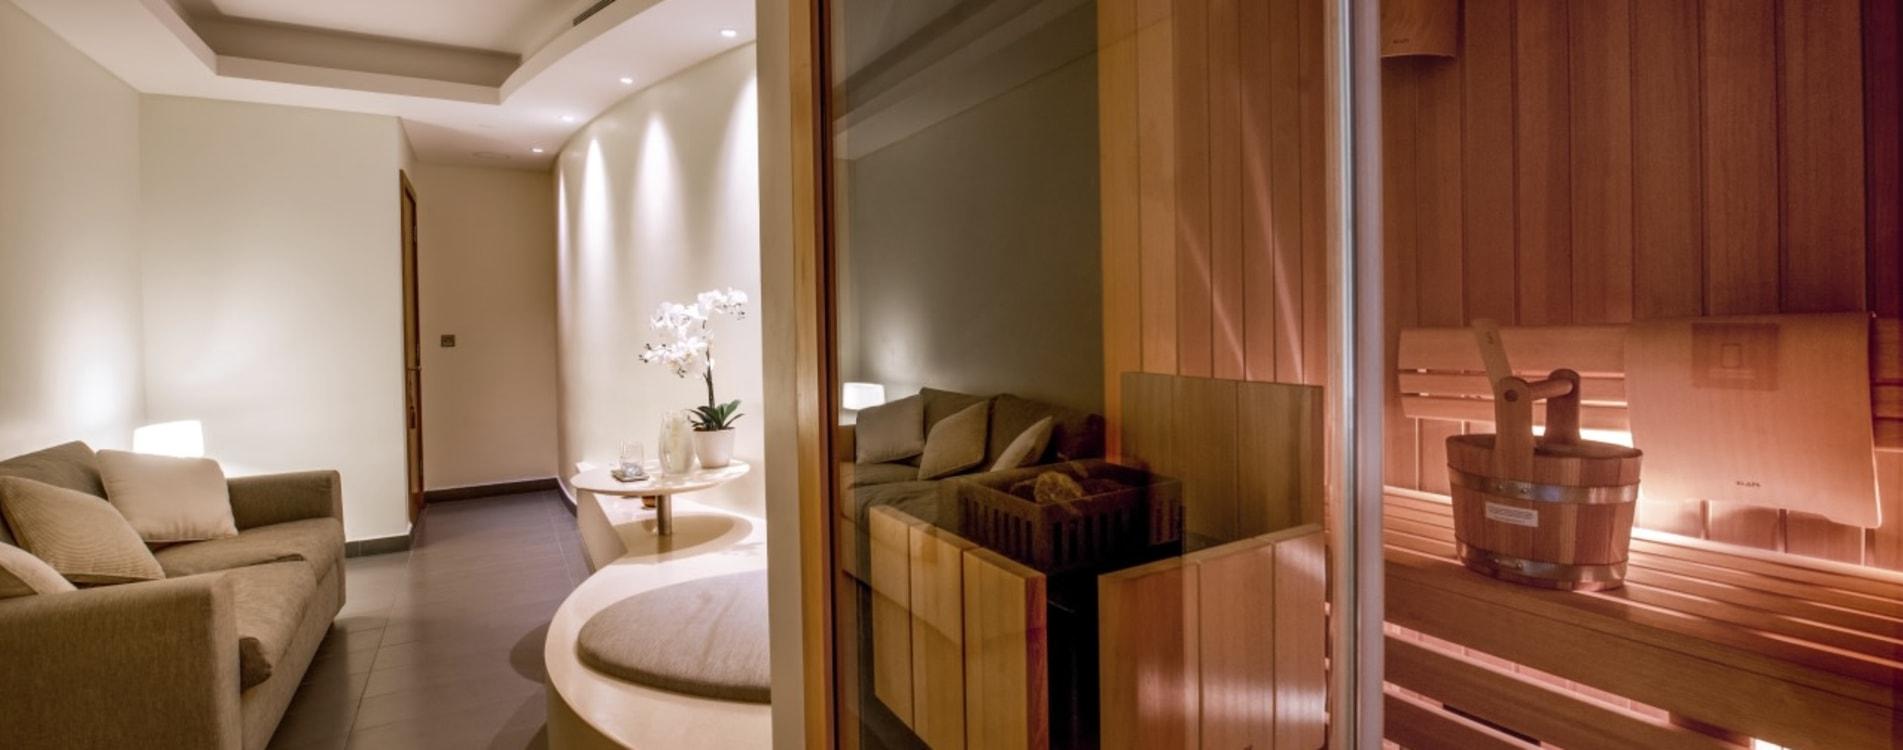 Kempinski-Hotel-Muscat-Kempinski-The-Spa-Couples-Suite-Oman.jpg